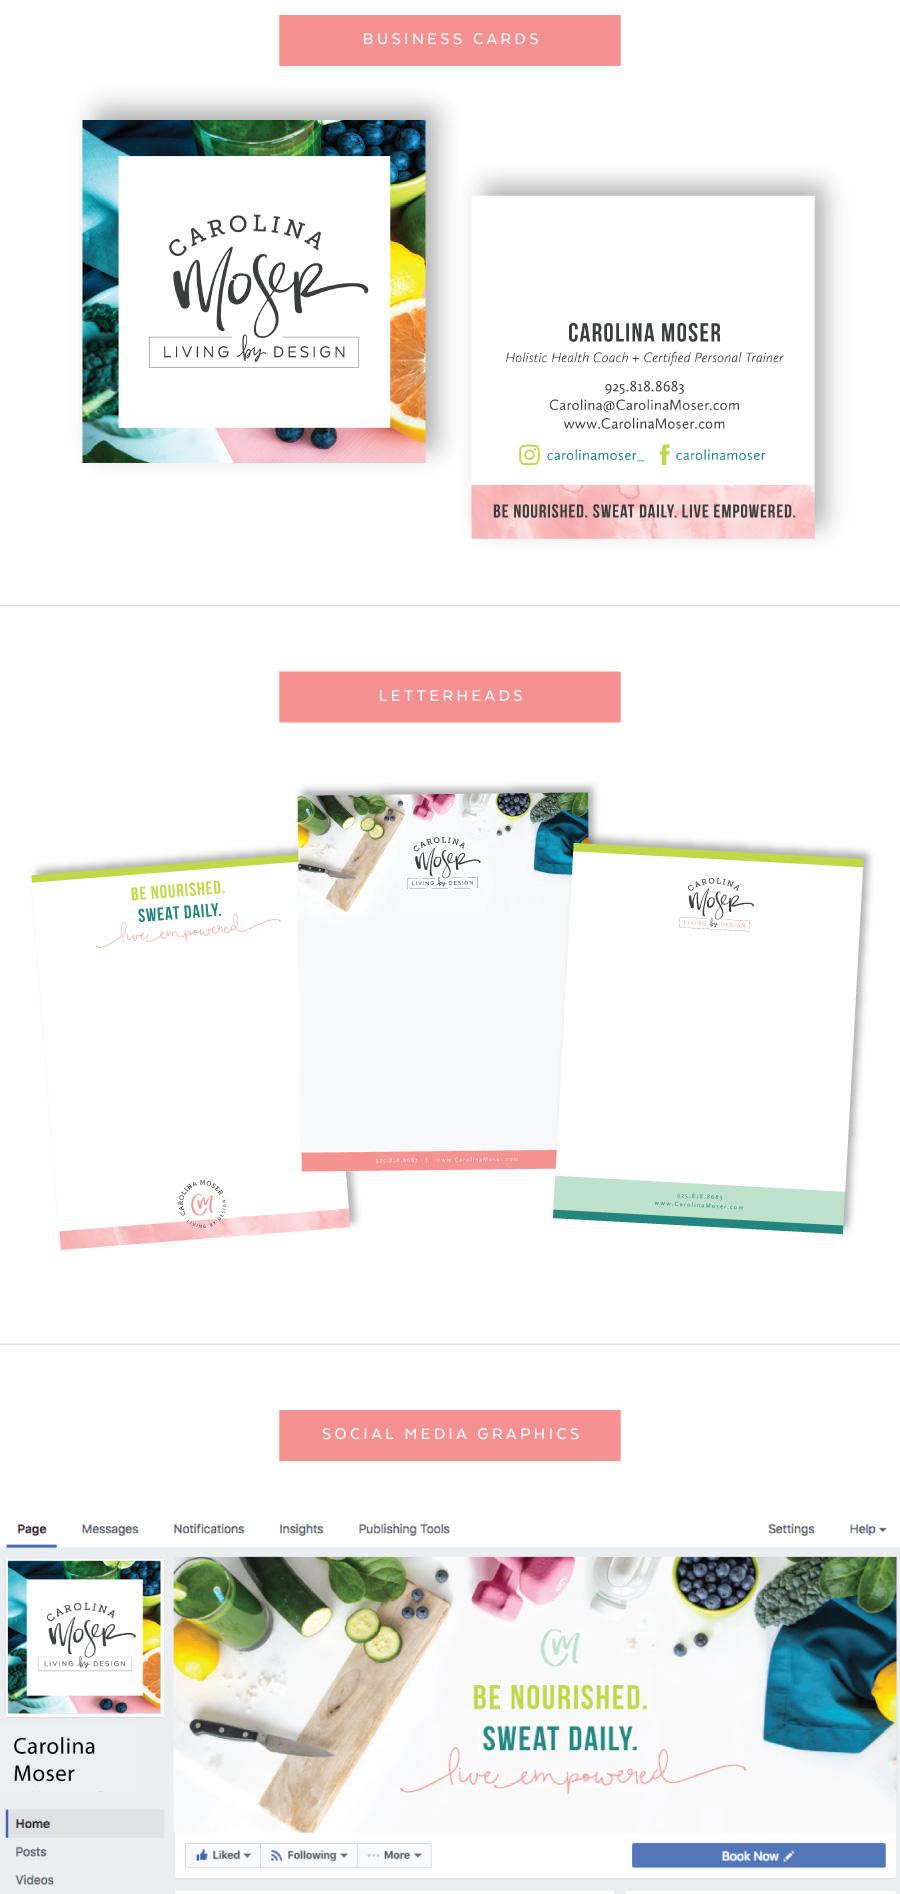 Carolina Moser Business Card Design - Brochure Design - Social Media Graphics - Marketing Materials for Brand